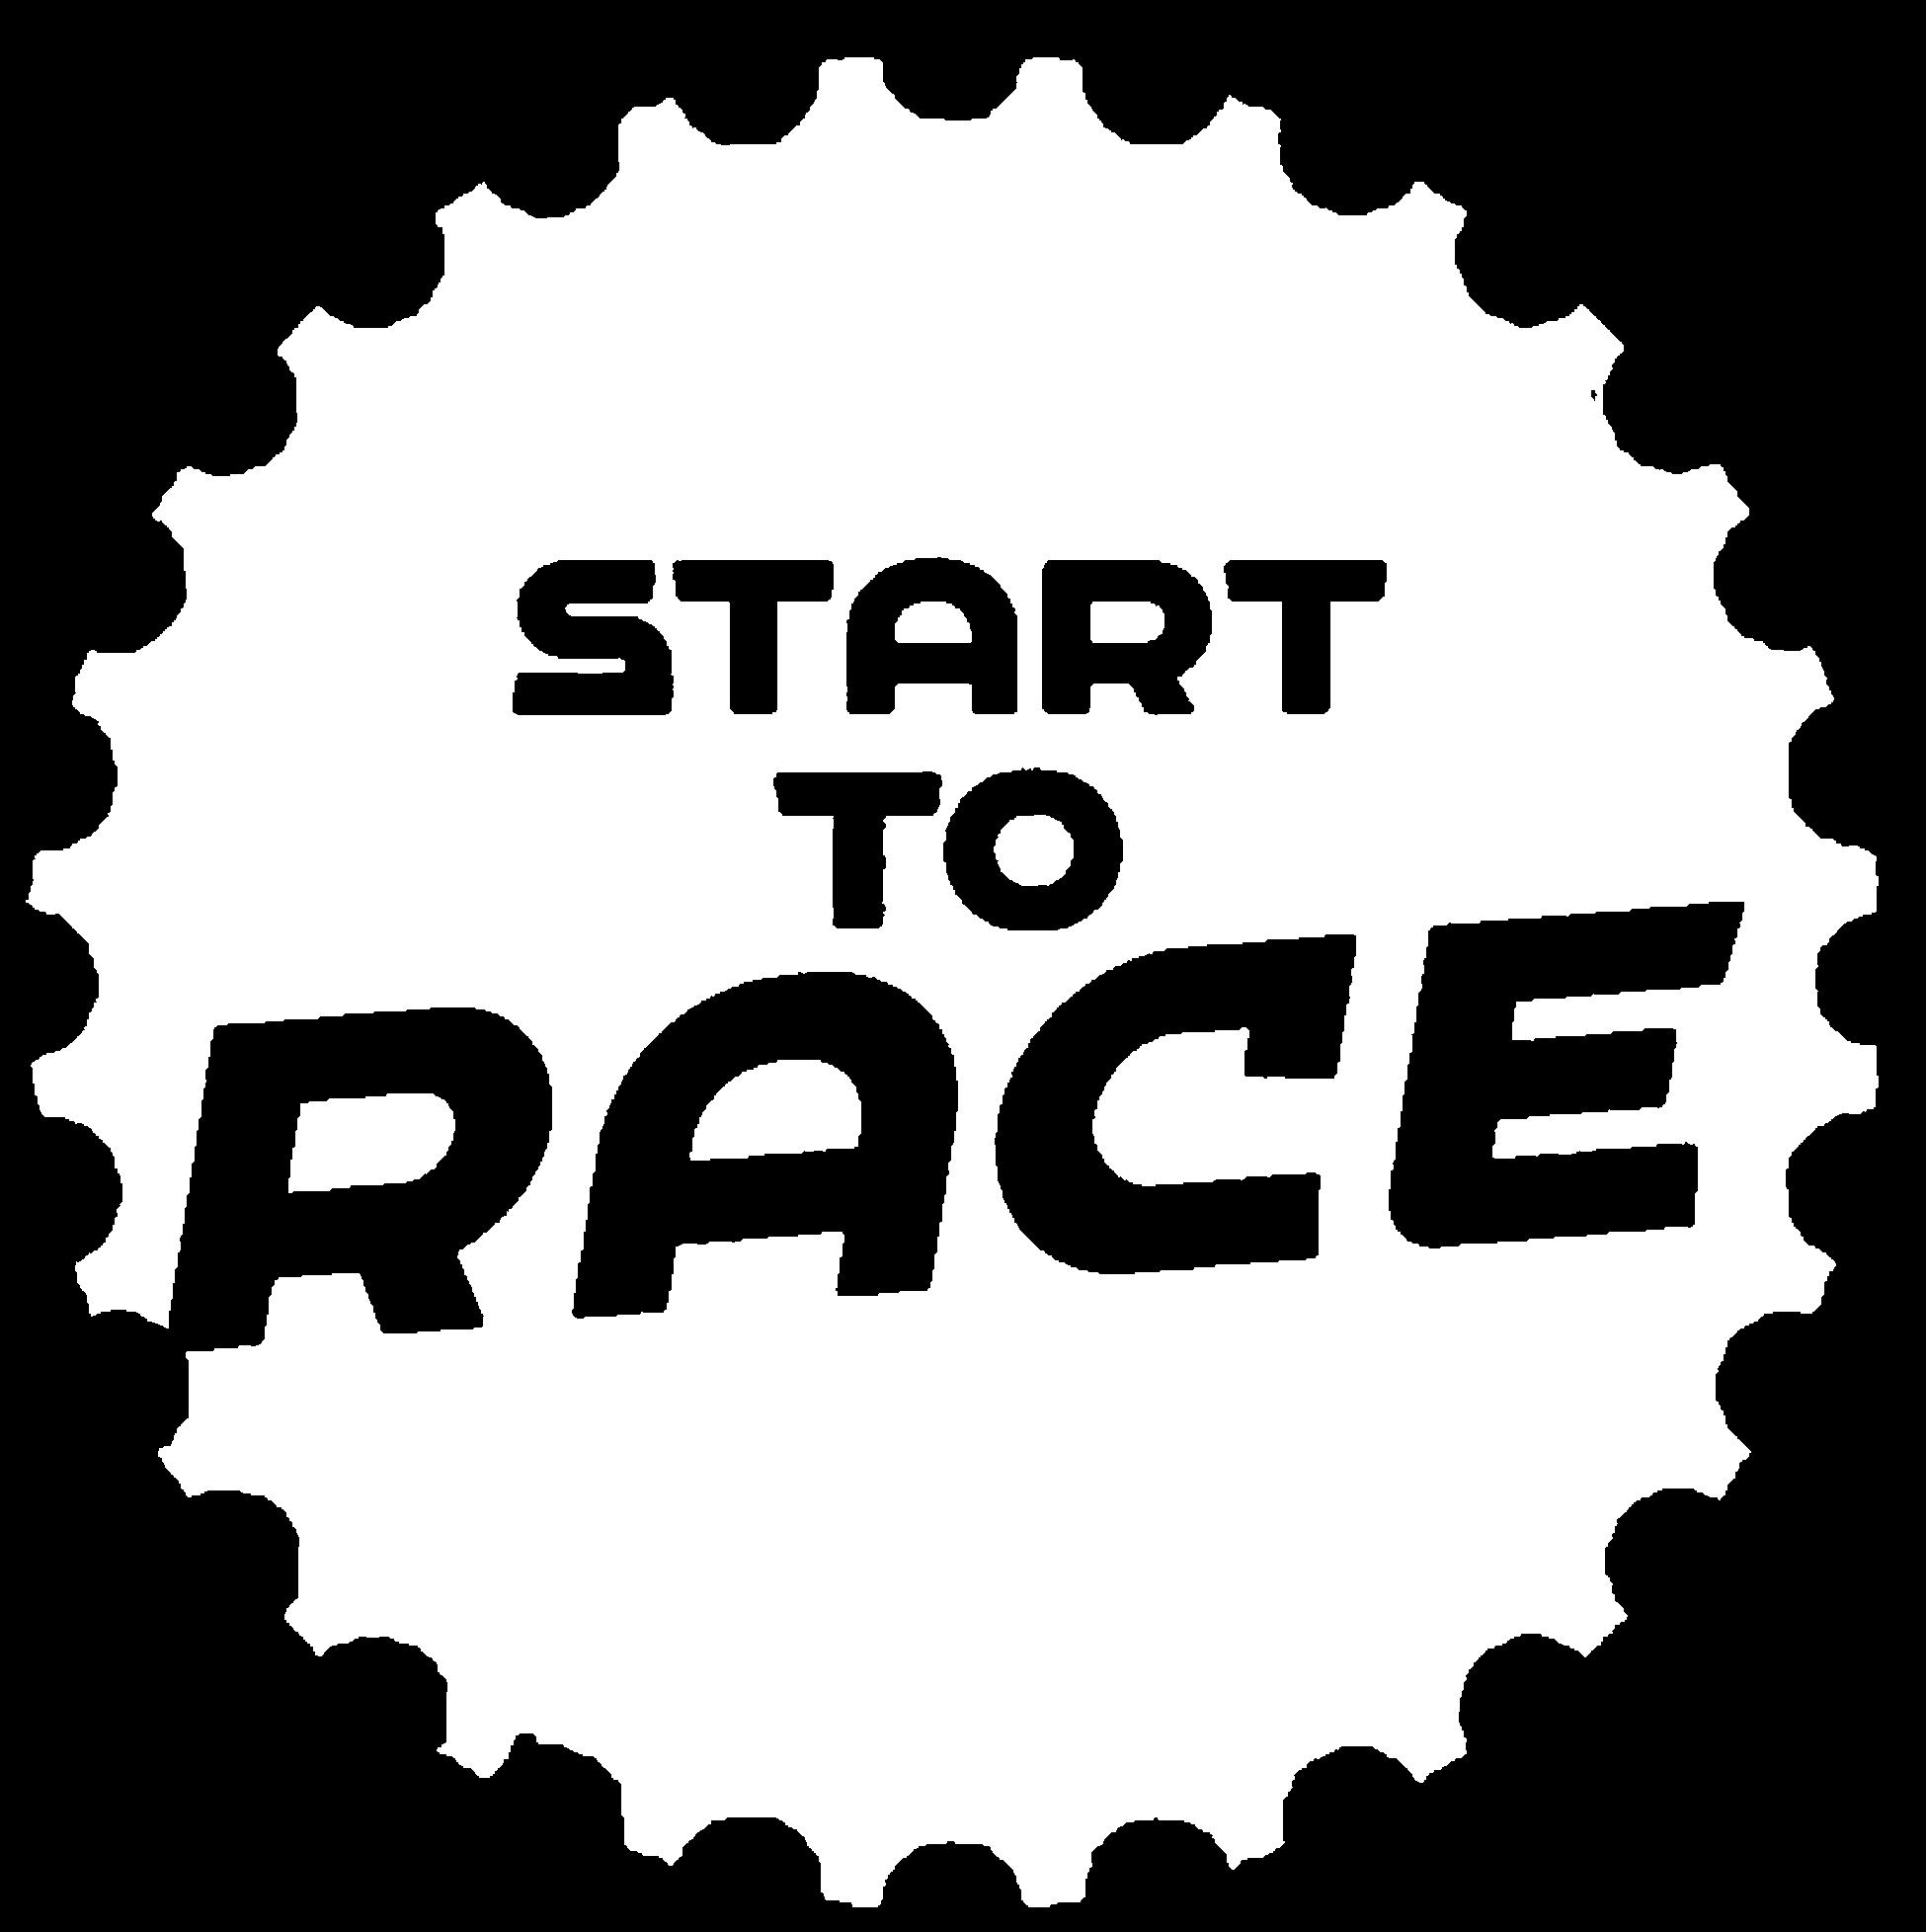 Starters trainingen